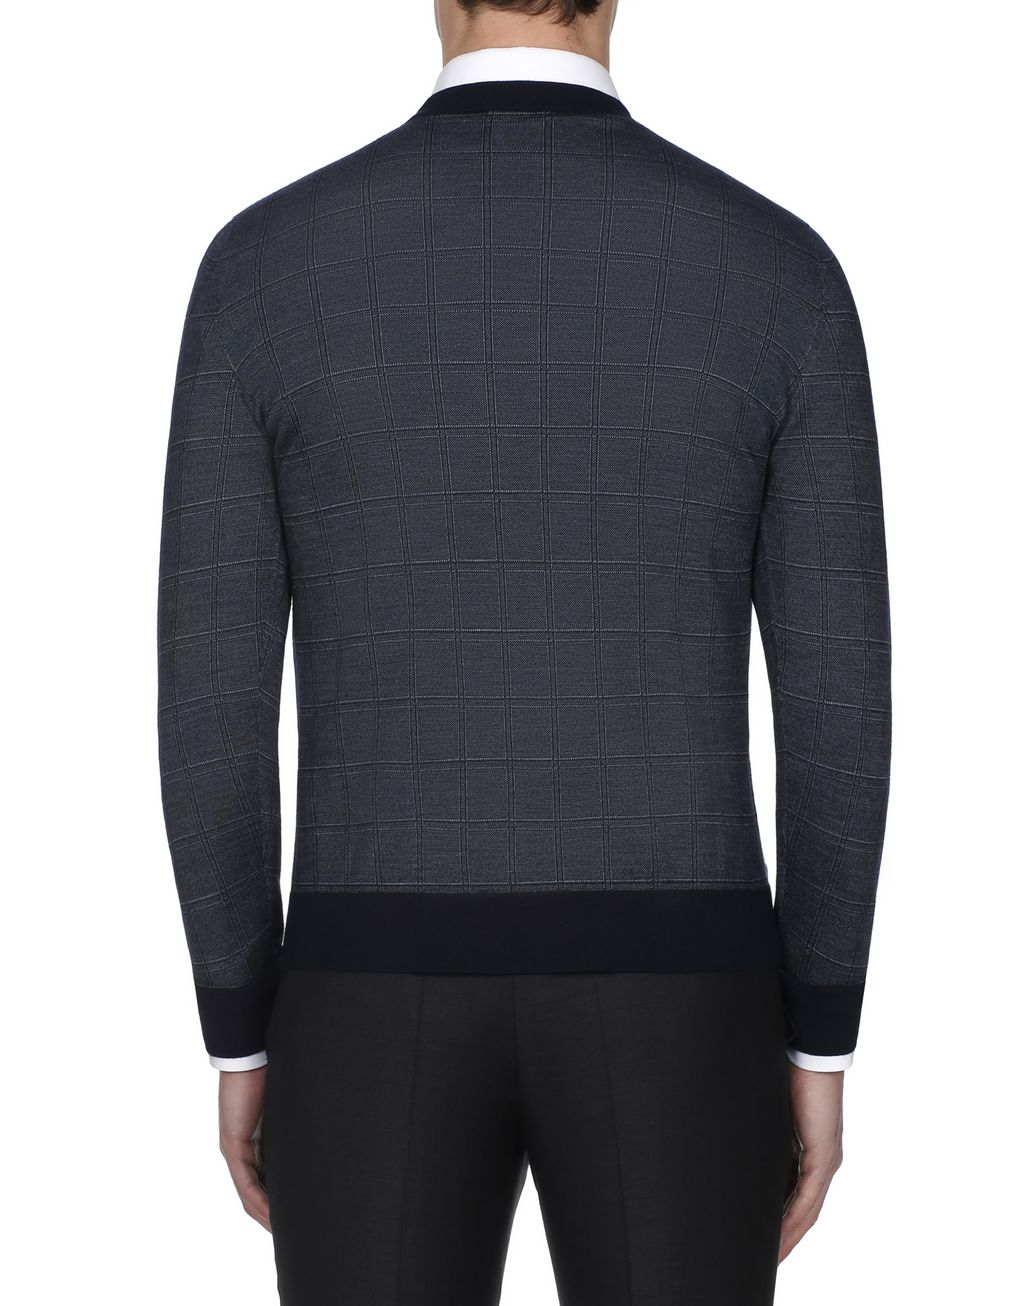 BRIONI Navy Blue Window Check Crew Neck Sweater Knitwear [*** pickupInStoreShippingNotGuaranteed_info ***] d